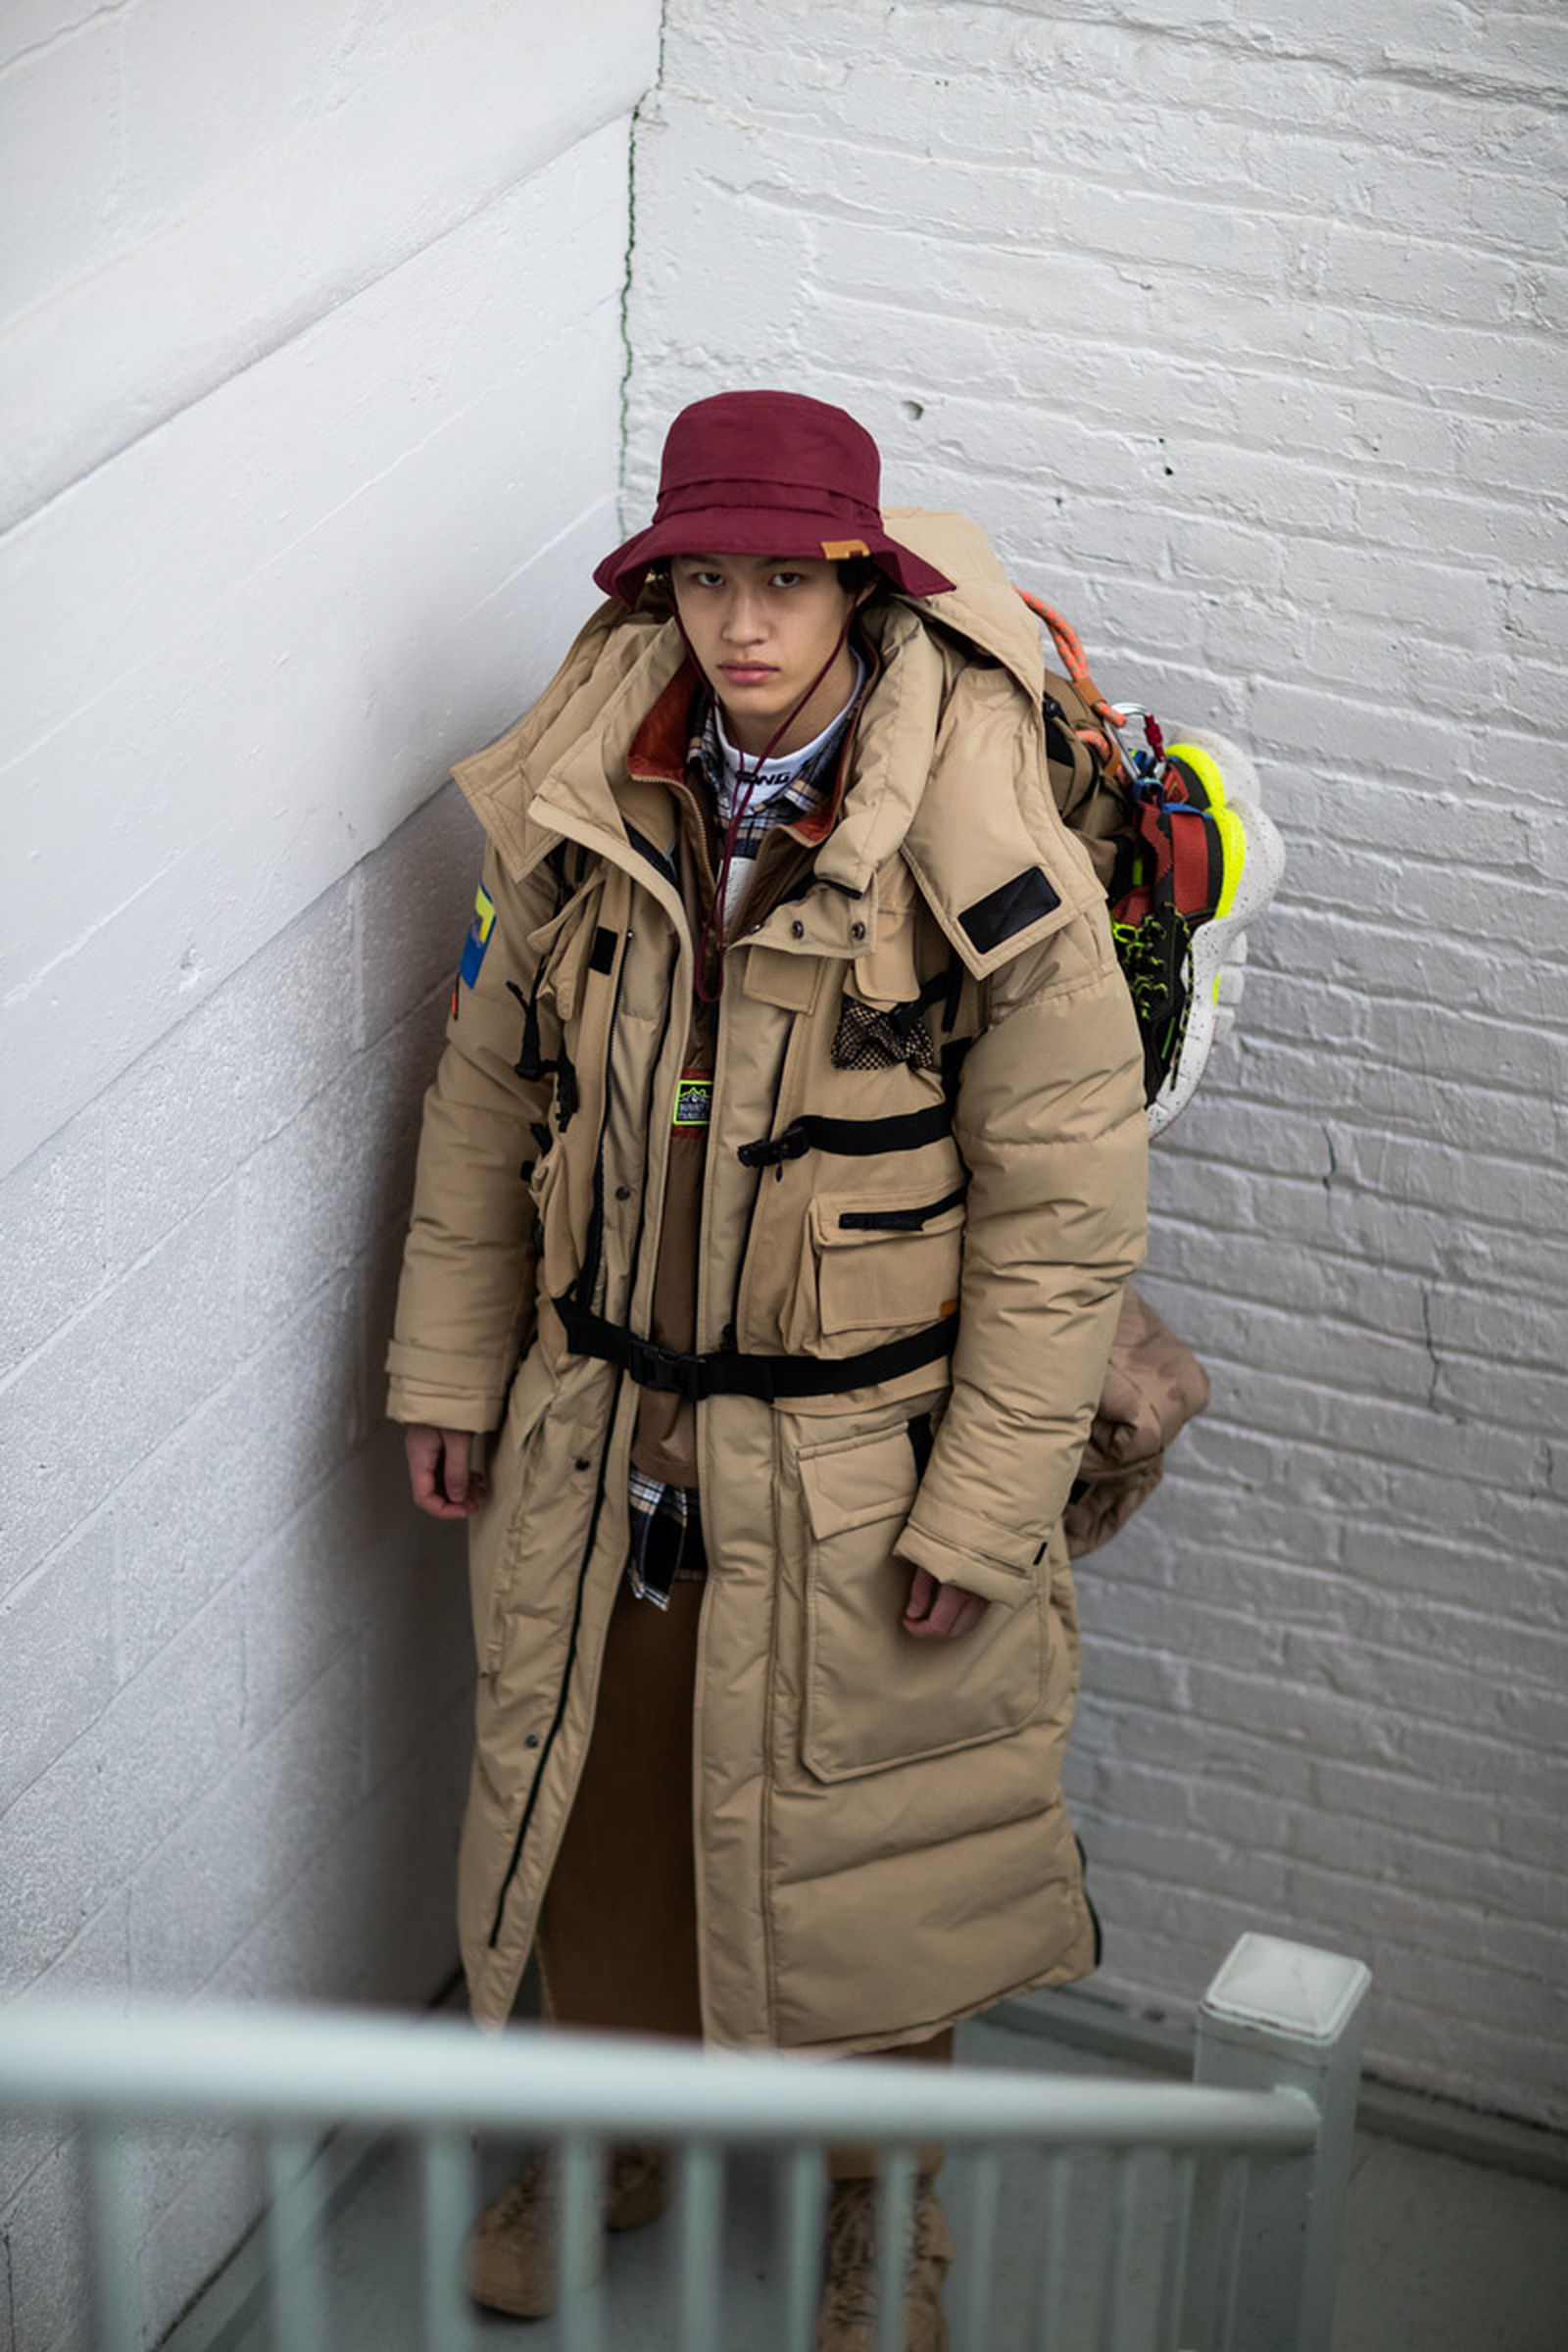 4li ning fw19 new york fashion week fall winter 2019 fashion shows nyfw